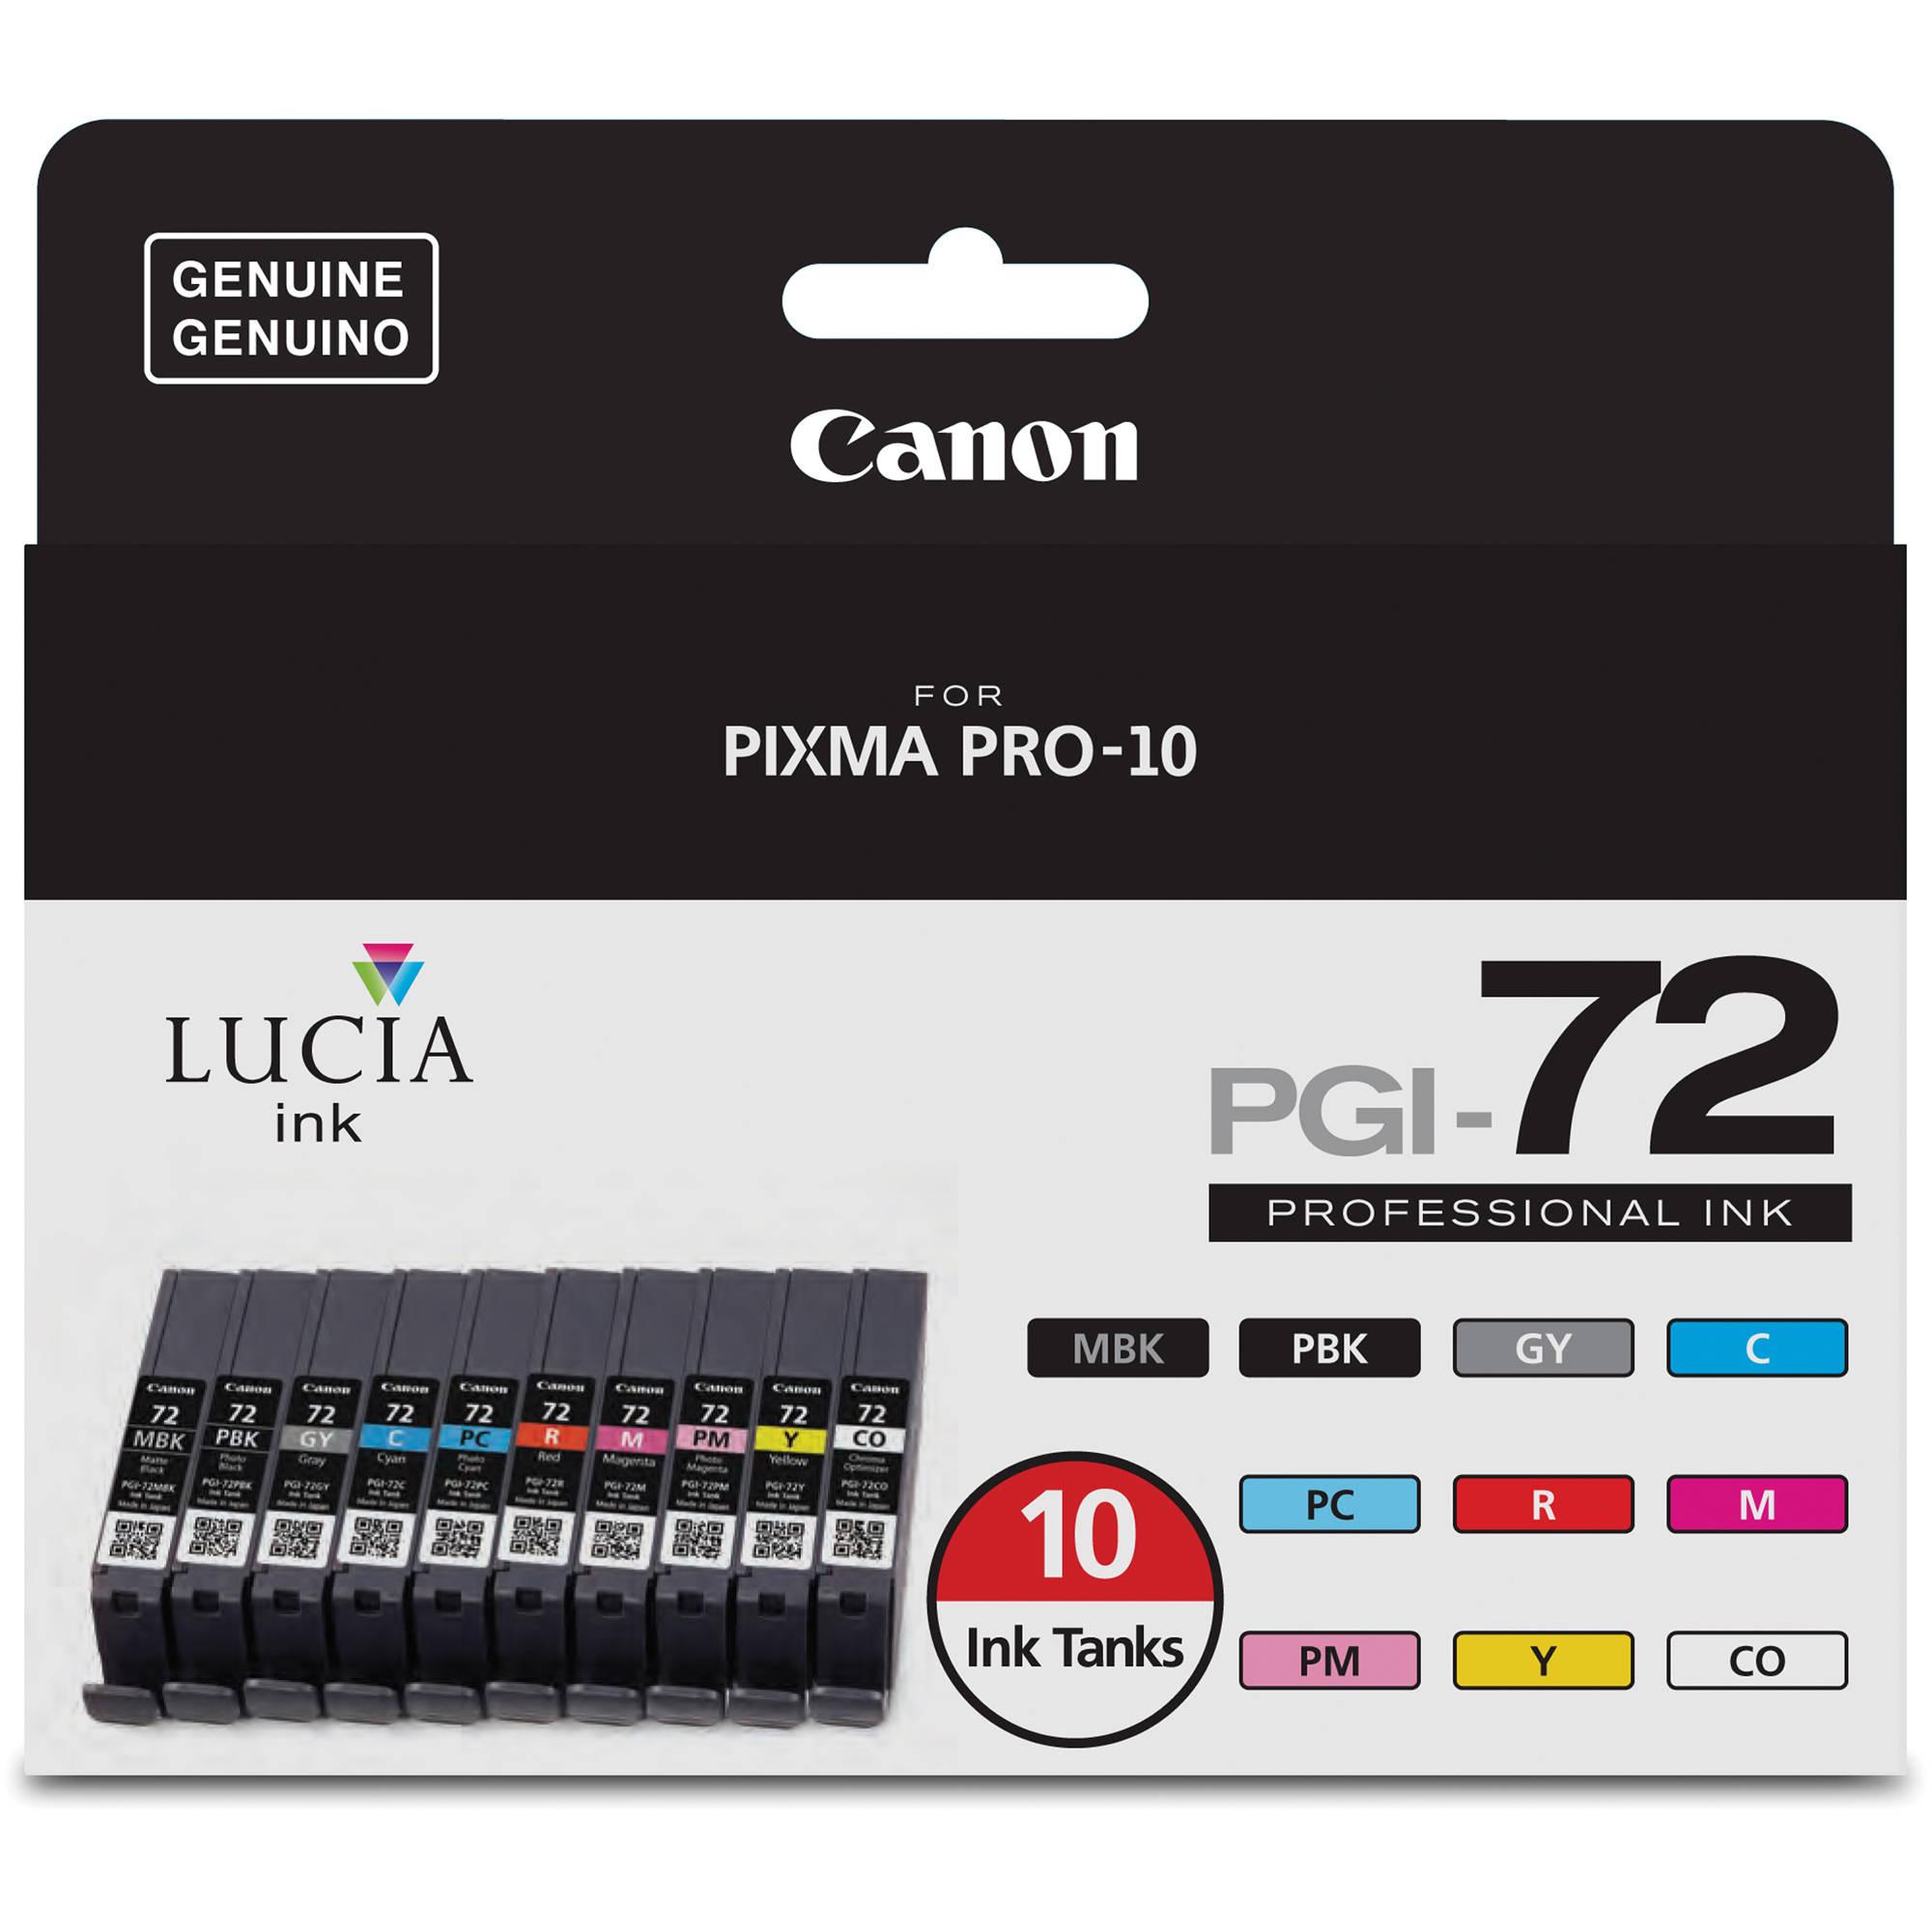 FULL SET 10 x Canon PGI-72 Compatible Ink Cartridge 72 Ink Canon Pixma Pro 10